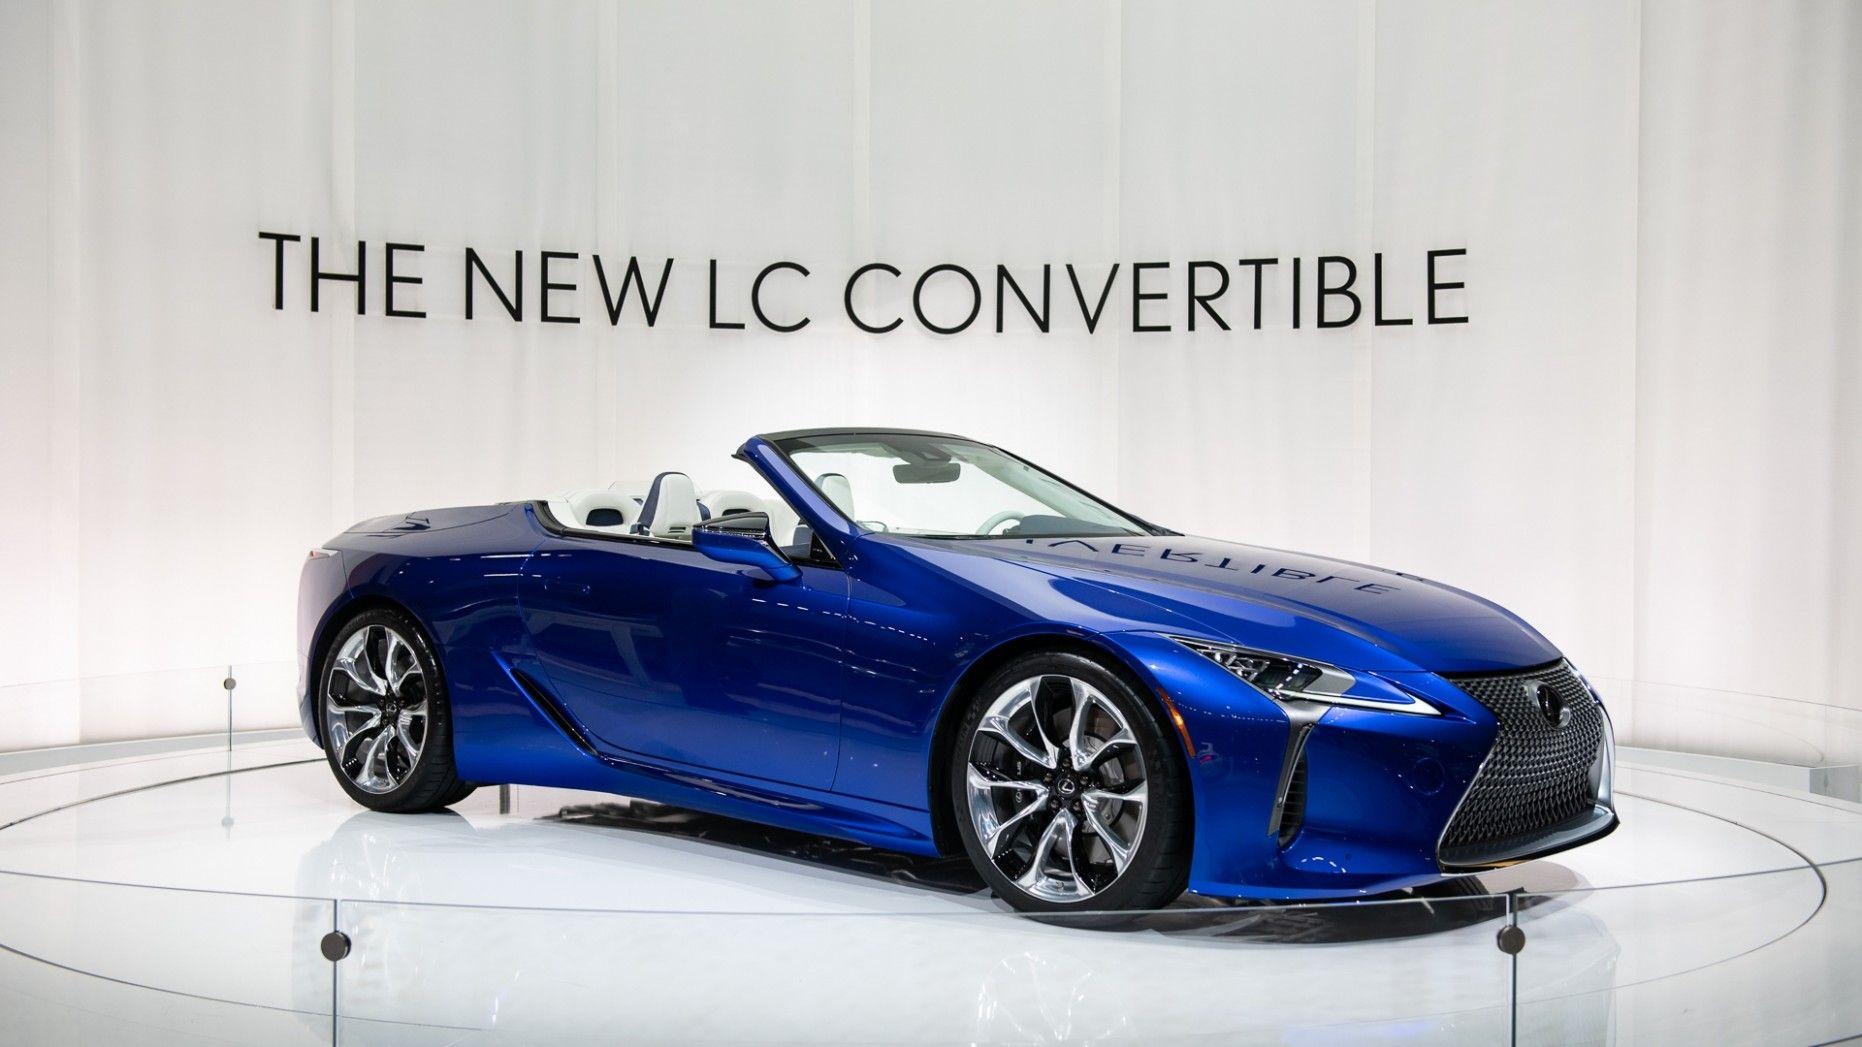 2021 Lexus Lf Lc In 2020 Lexus Tokyo Motor Show Vw Sharan